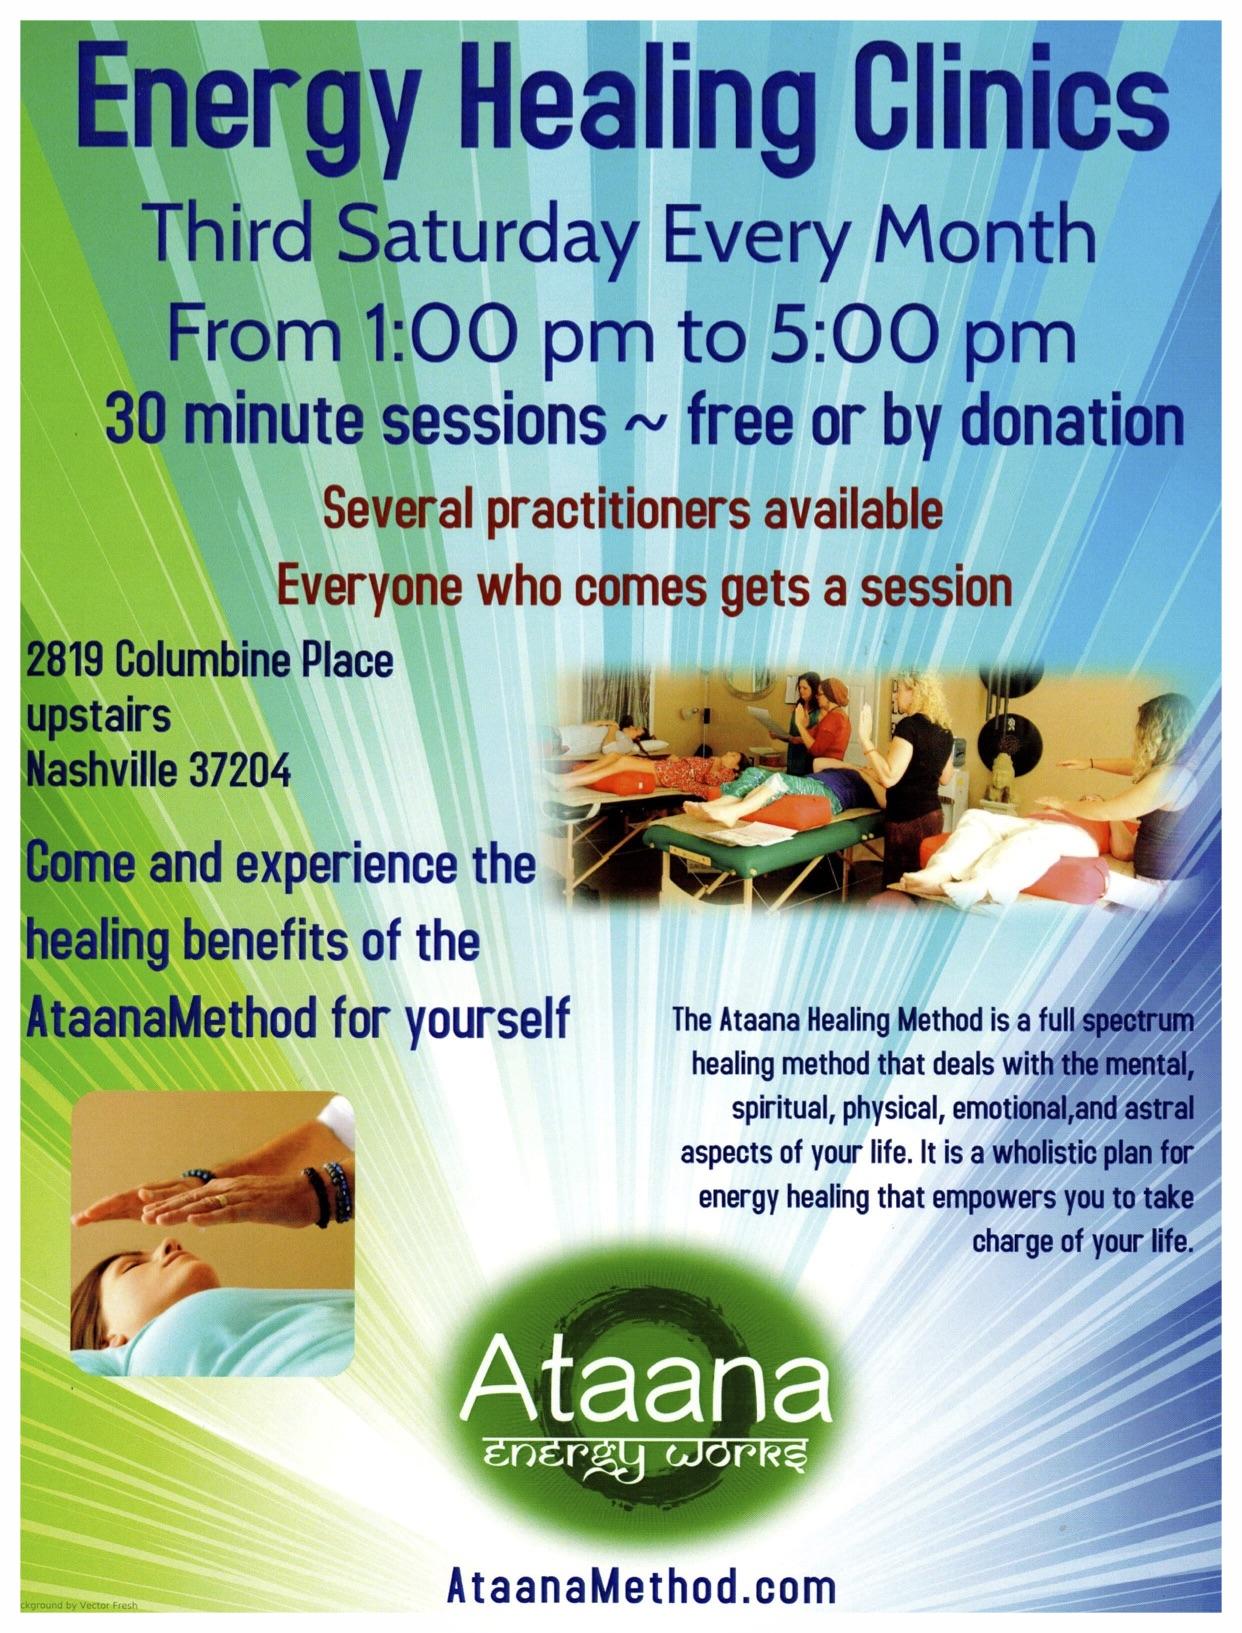 Energy Healing Clinics.jpg